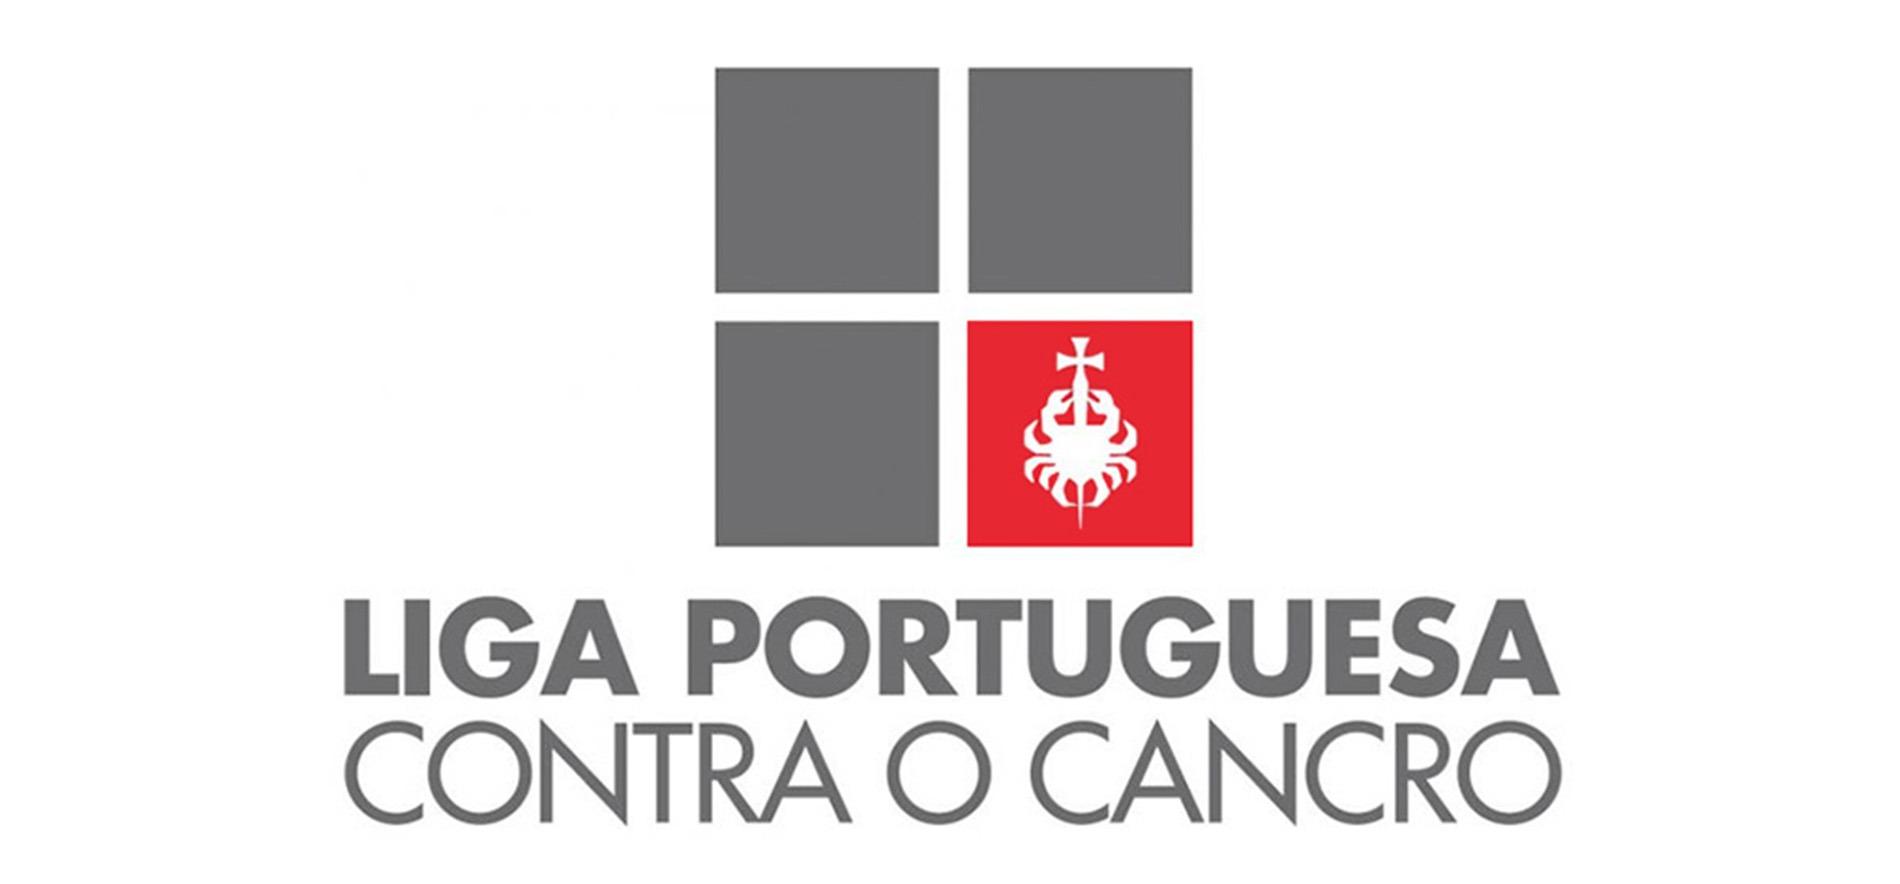 G2 Liga Portuguesa cancro